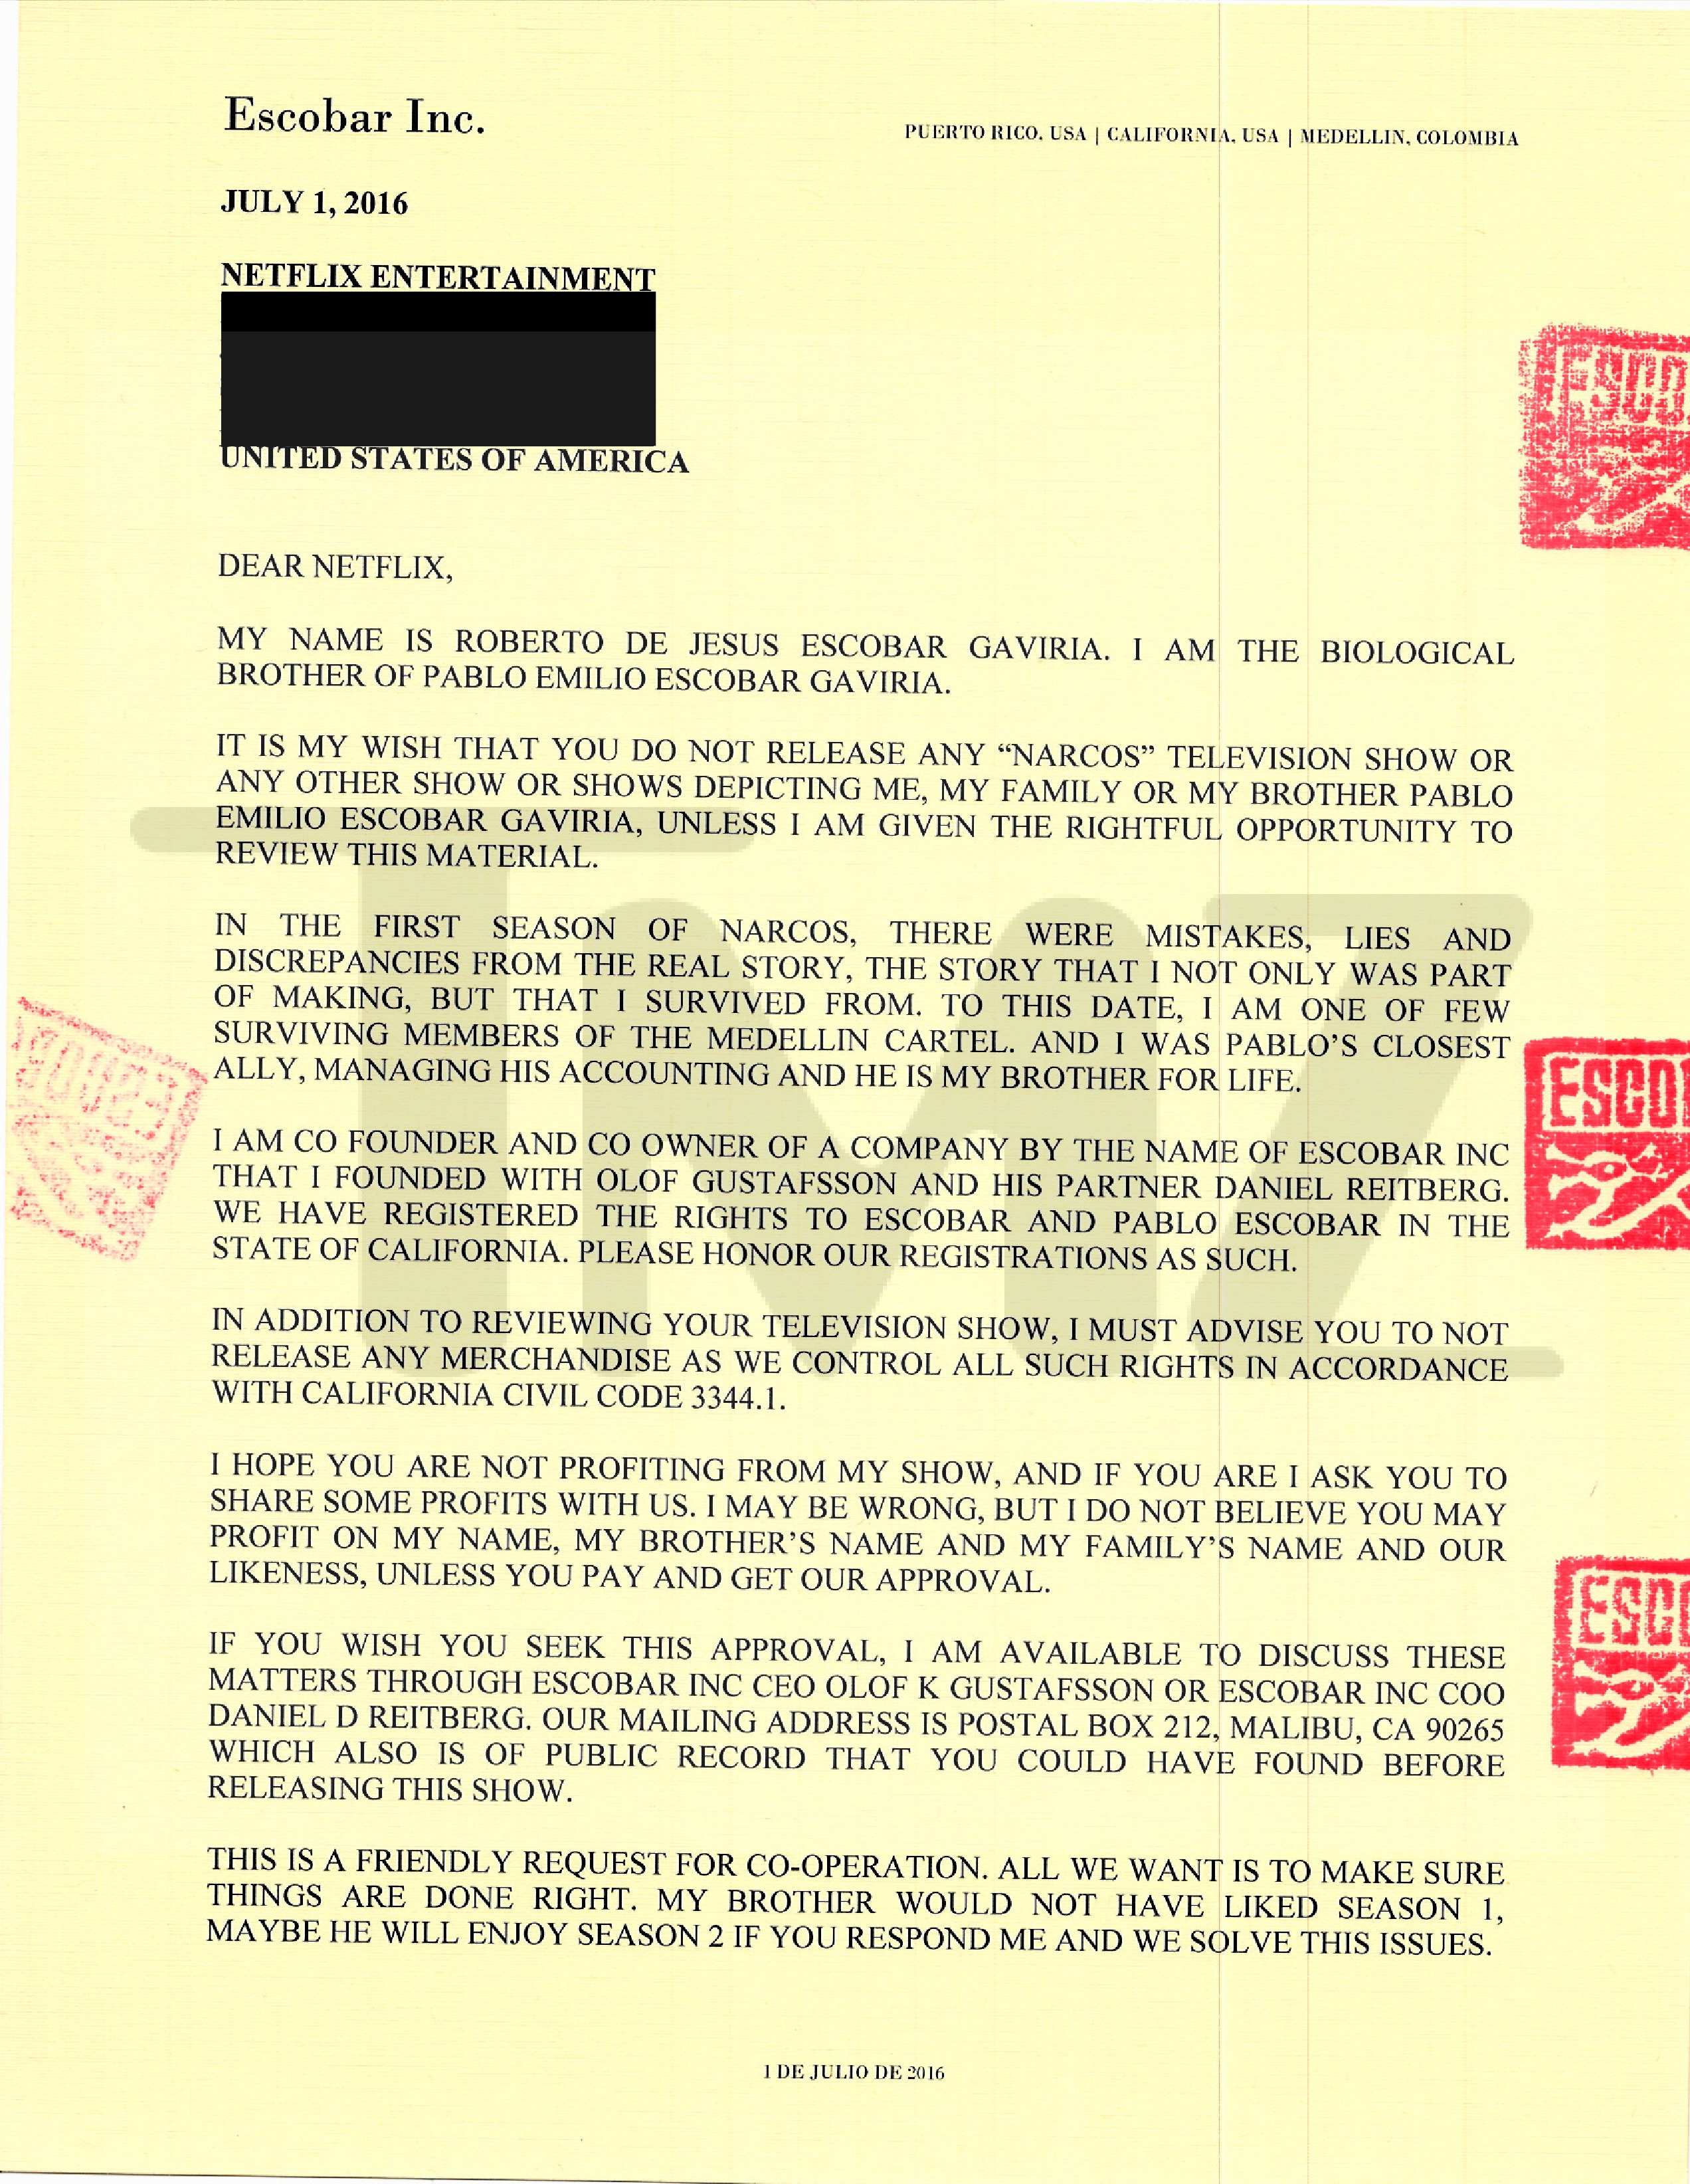 pablo_escobar_letter-page-0.jpg